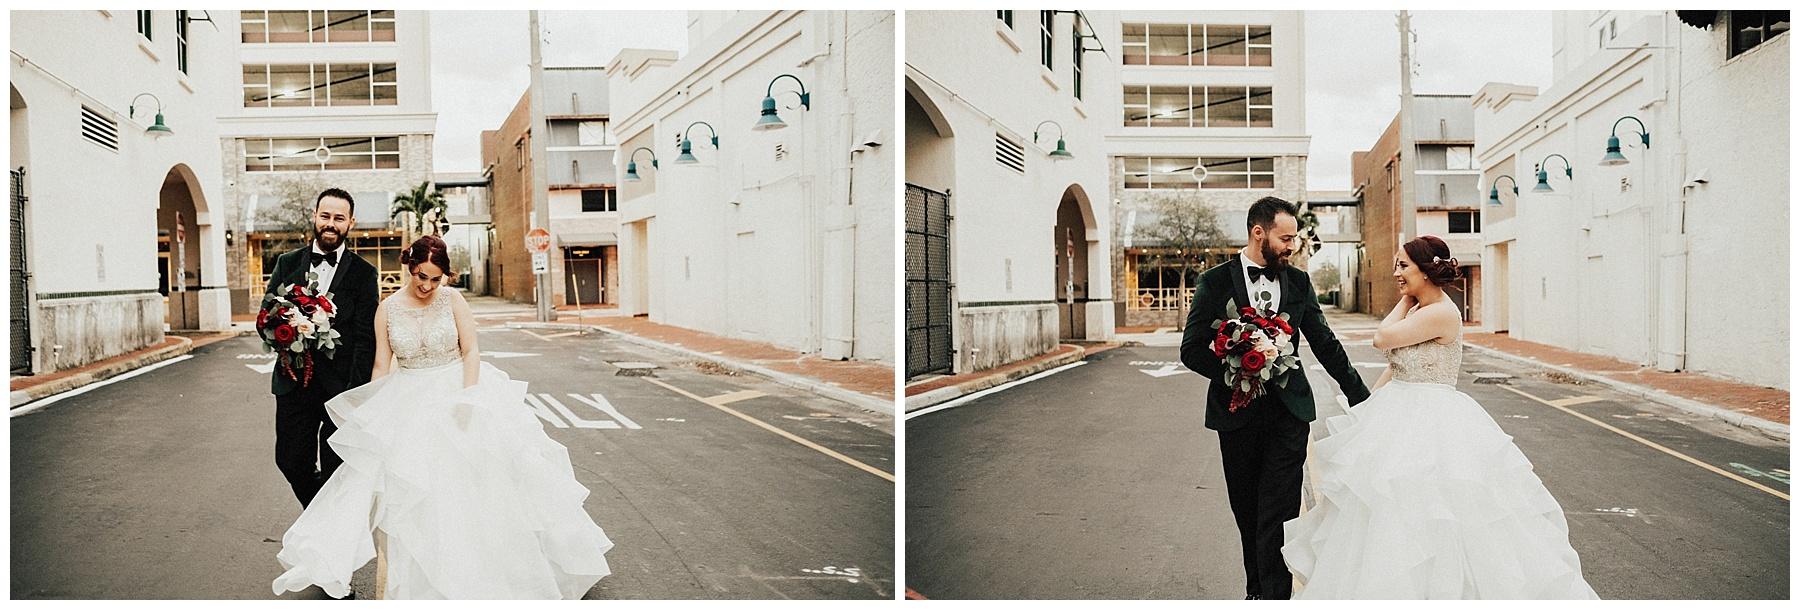 Fort Lauderdale Wedding Tampa Wedding Photographer-126.jpg